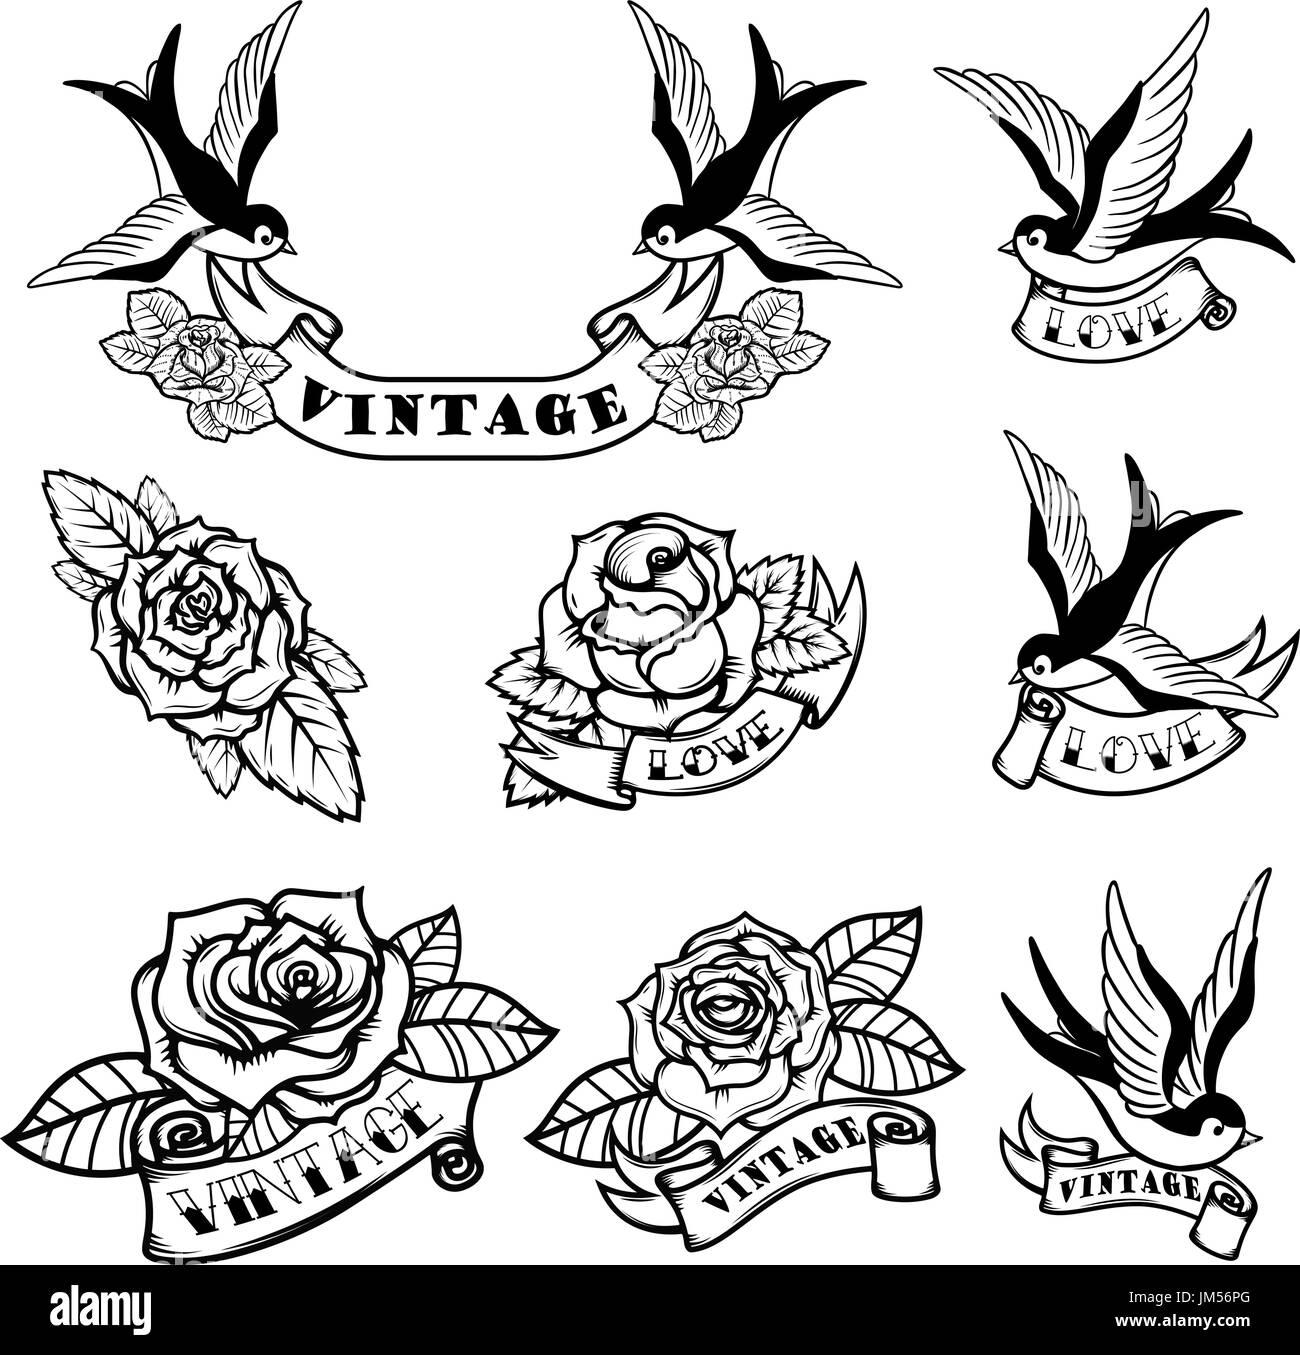 rose tattoo stockfotos rose tattoo bilder alamy. Black Bedroom Furniture Sets. Home Design Ideas